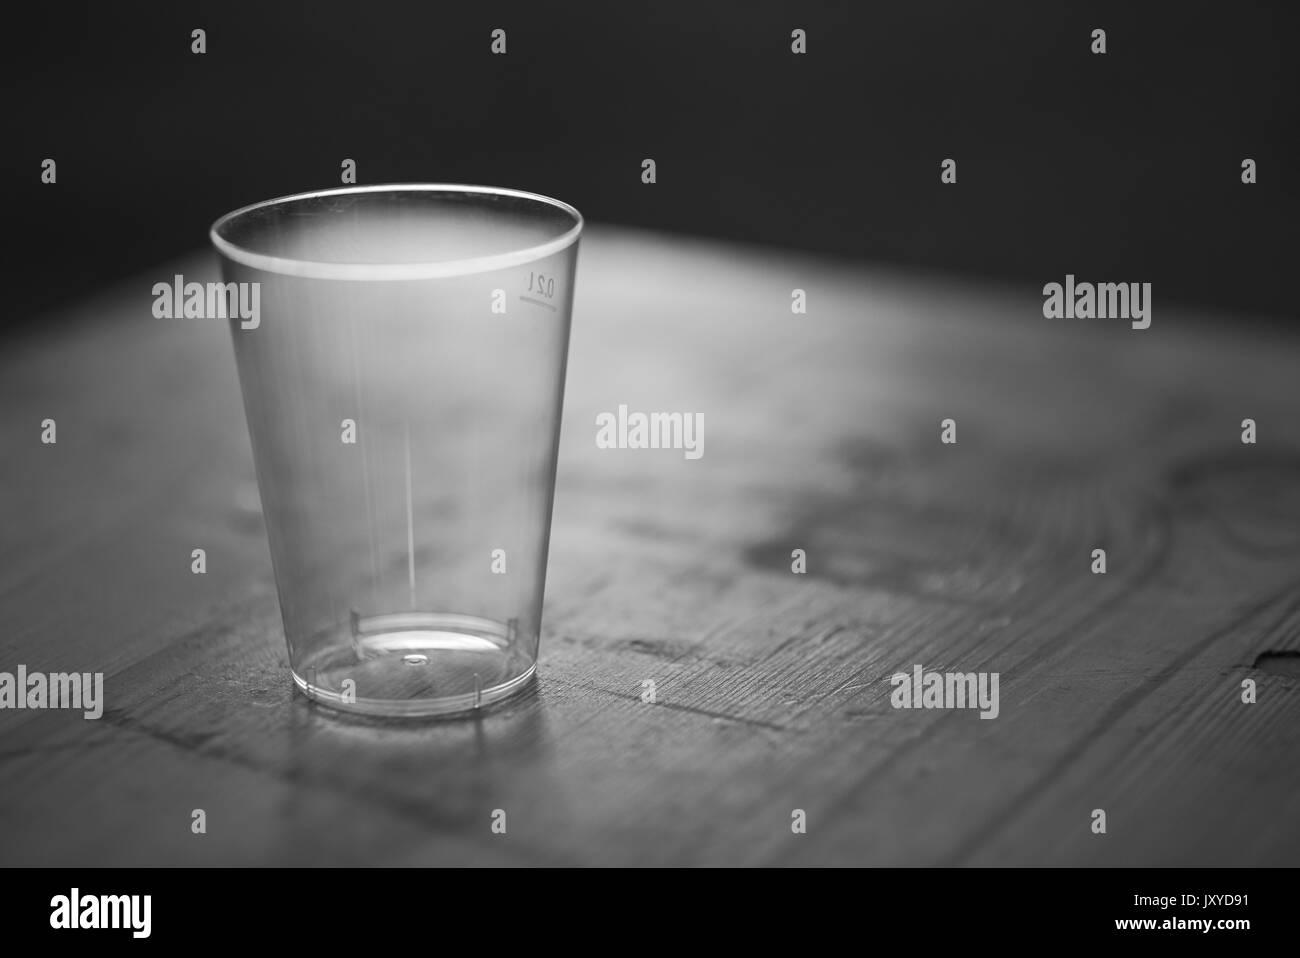 plastic cup edited - photo #26